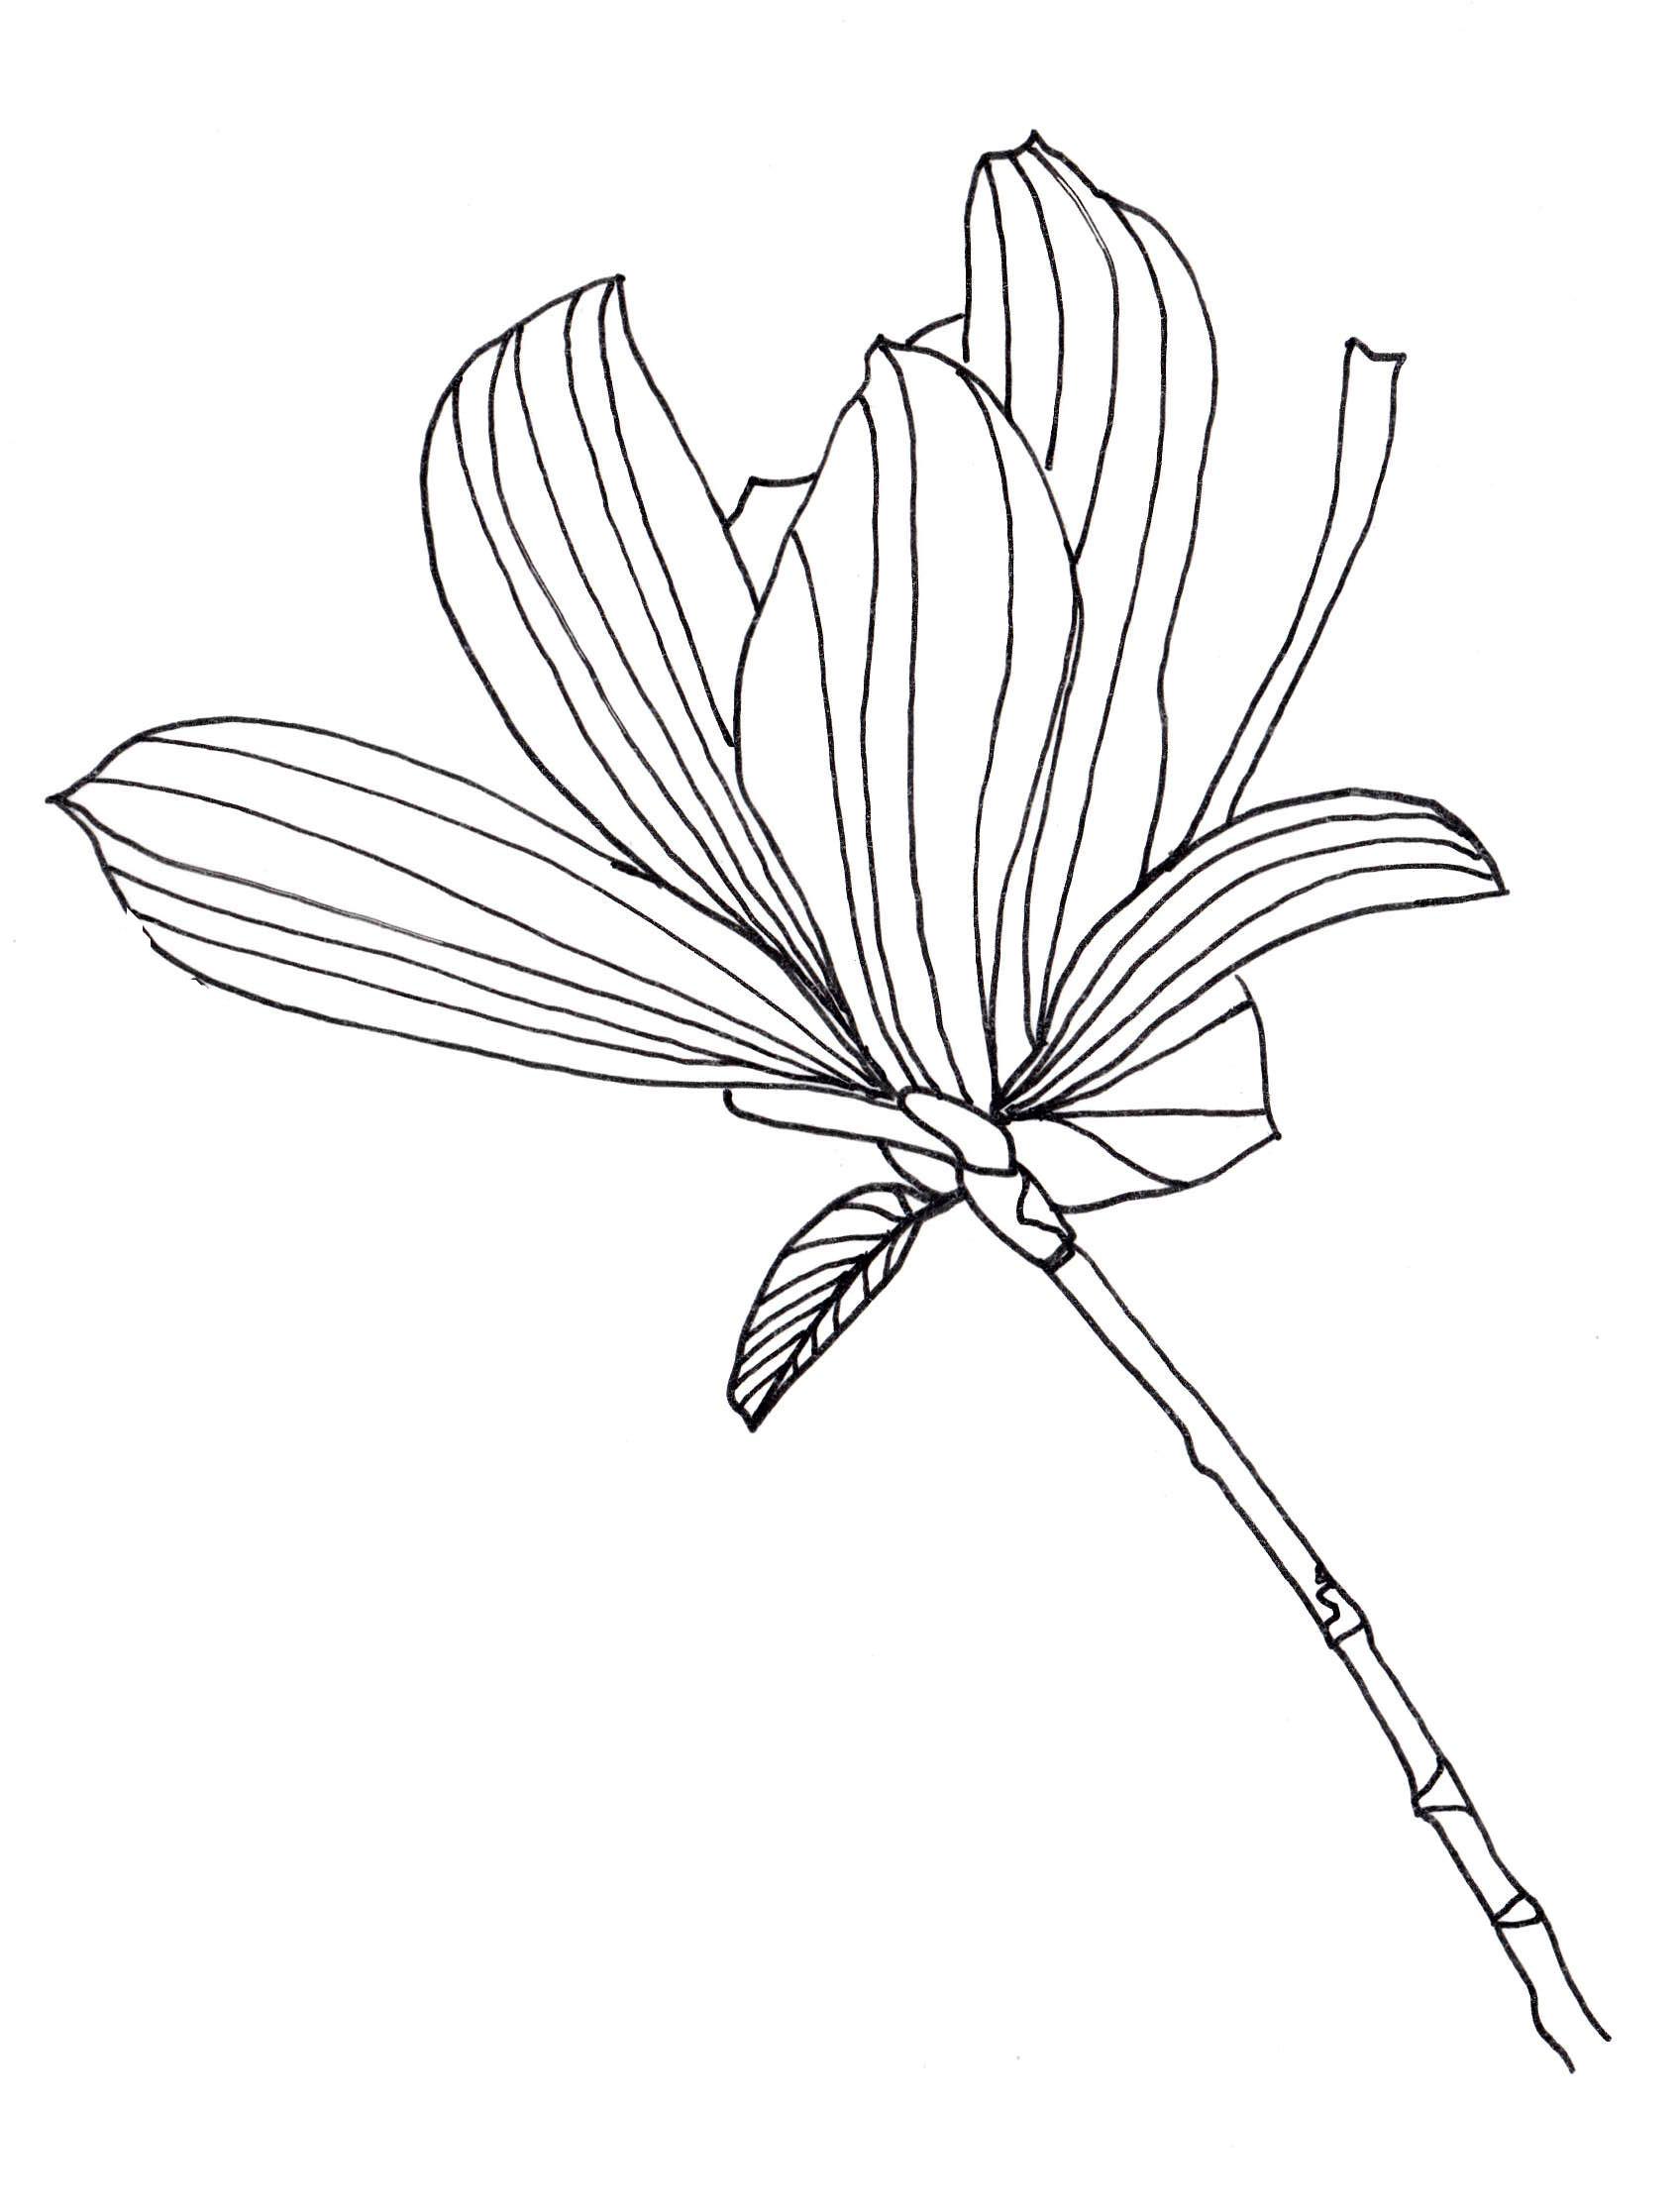 1696x2232 Line Drawing